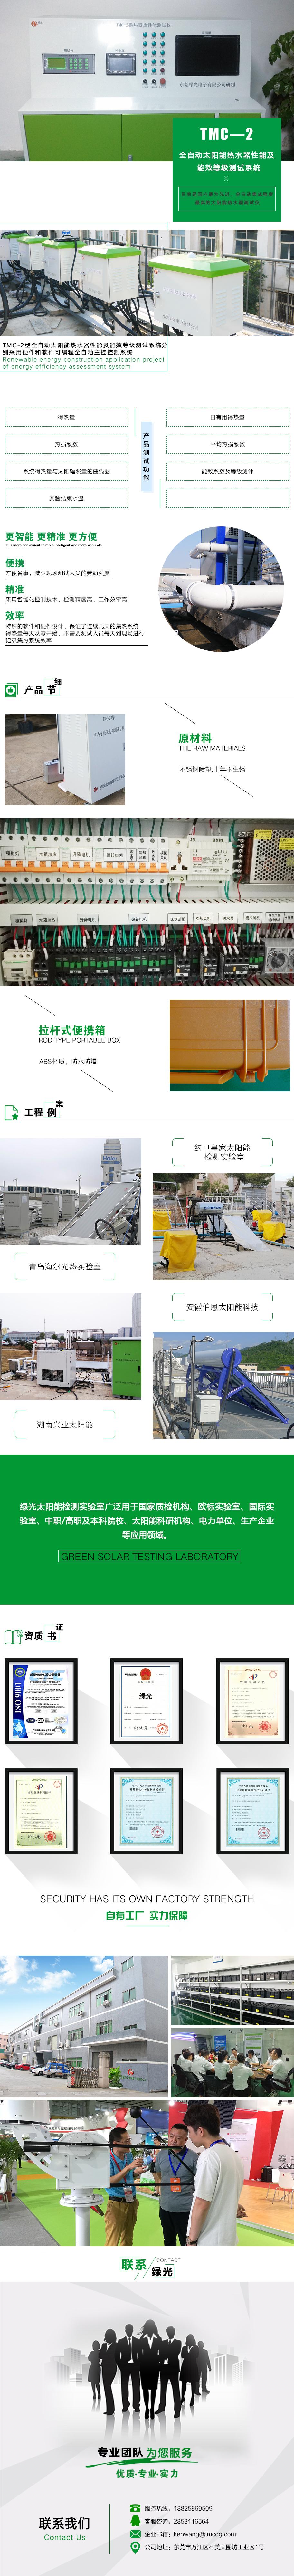 TMC—2型全自动太阳能热水器性能及能效等级测试系统.jpg